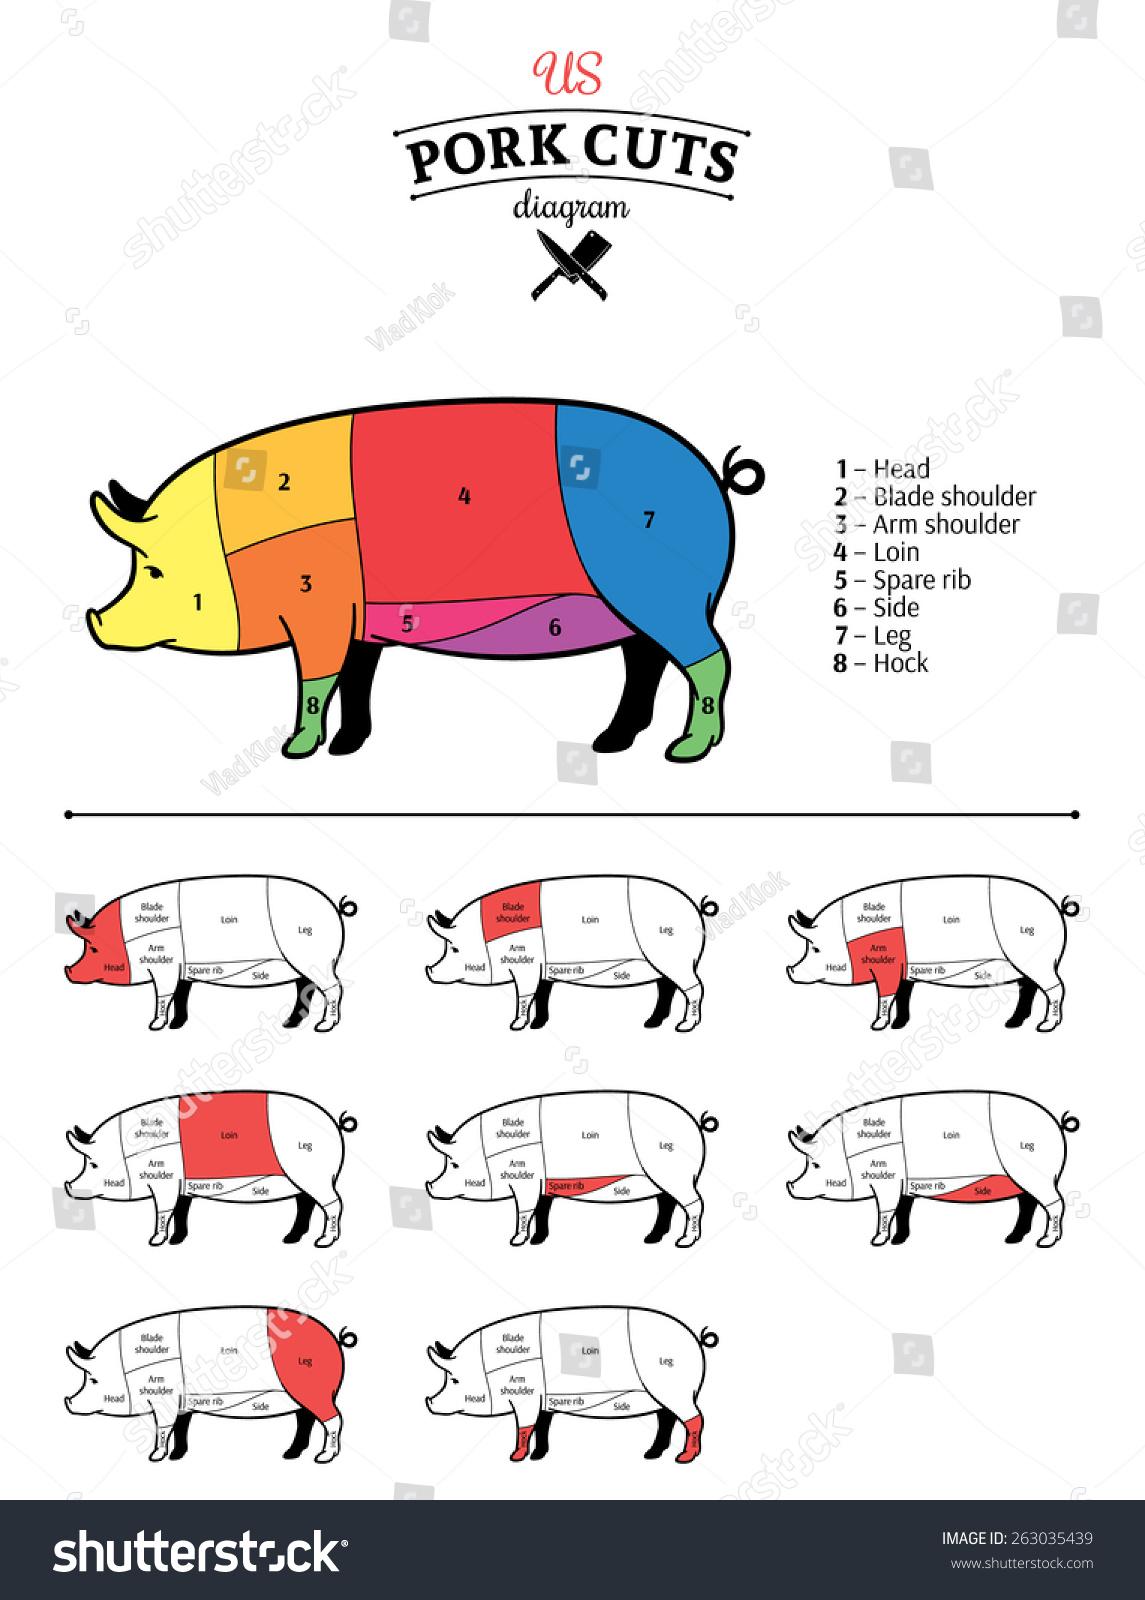 hight resolution of american us pork cuts diagram